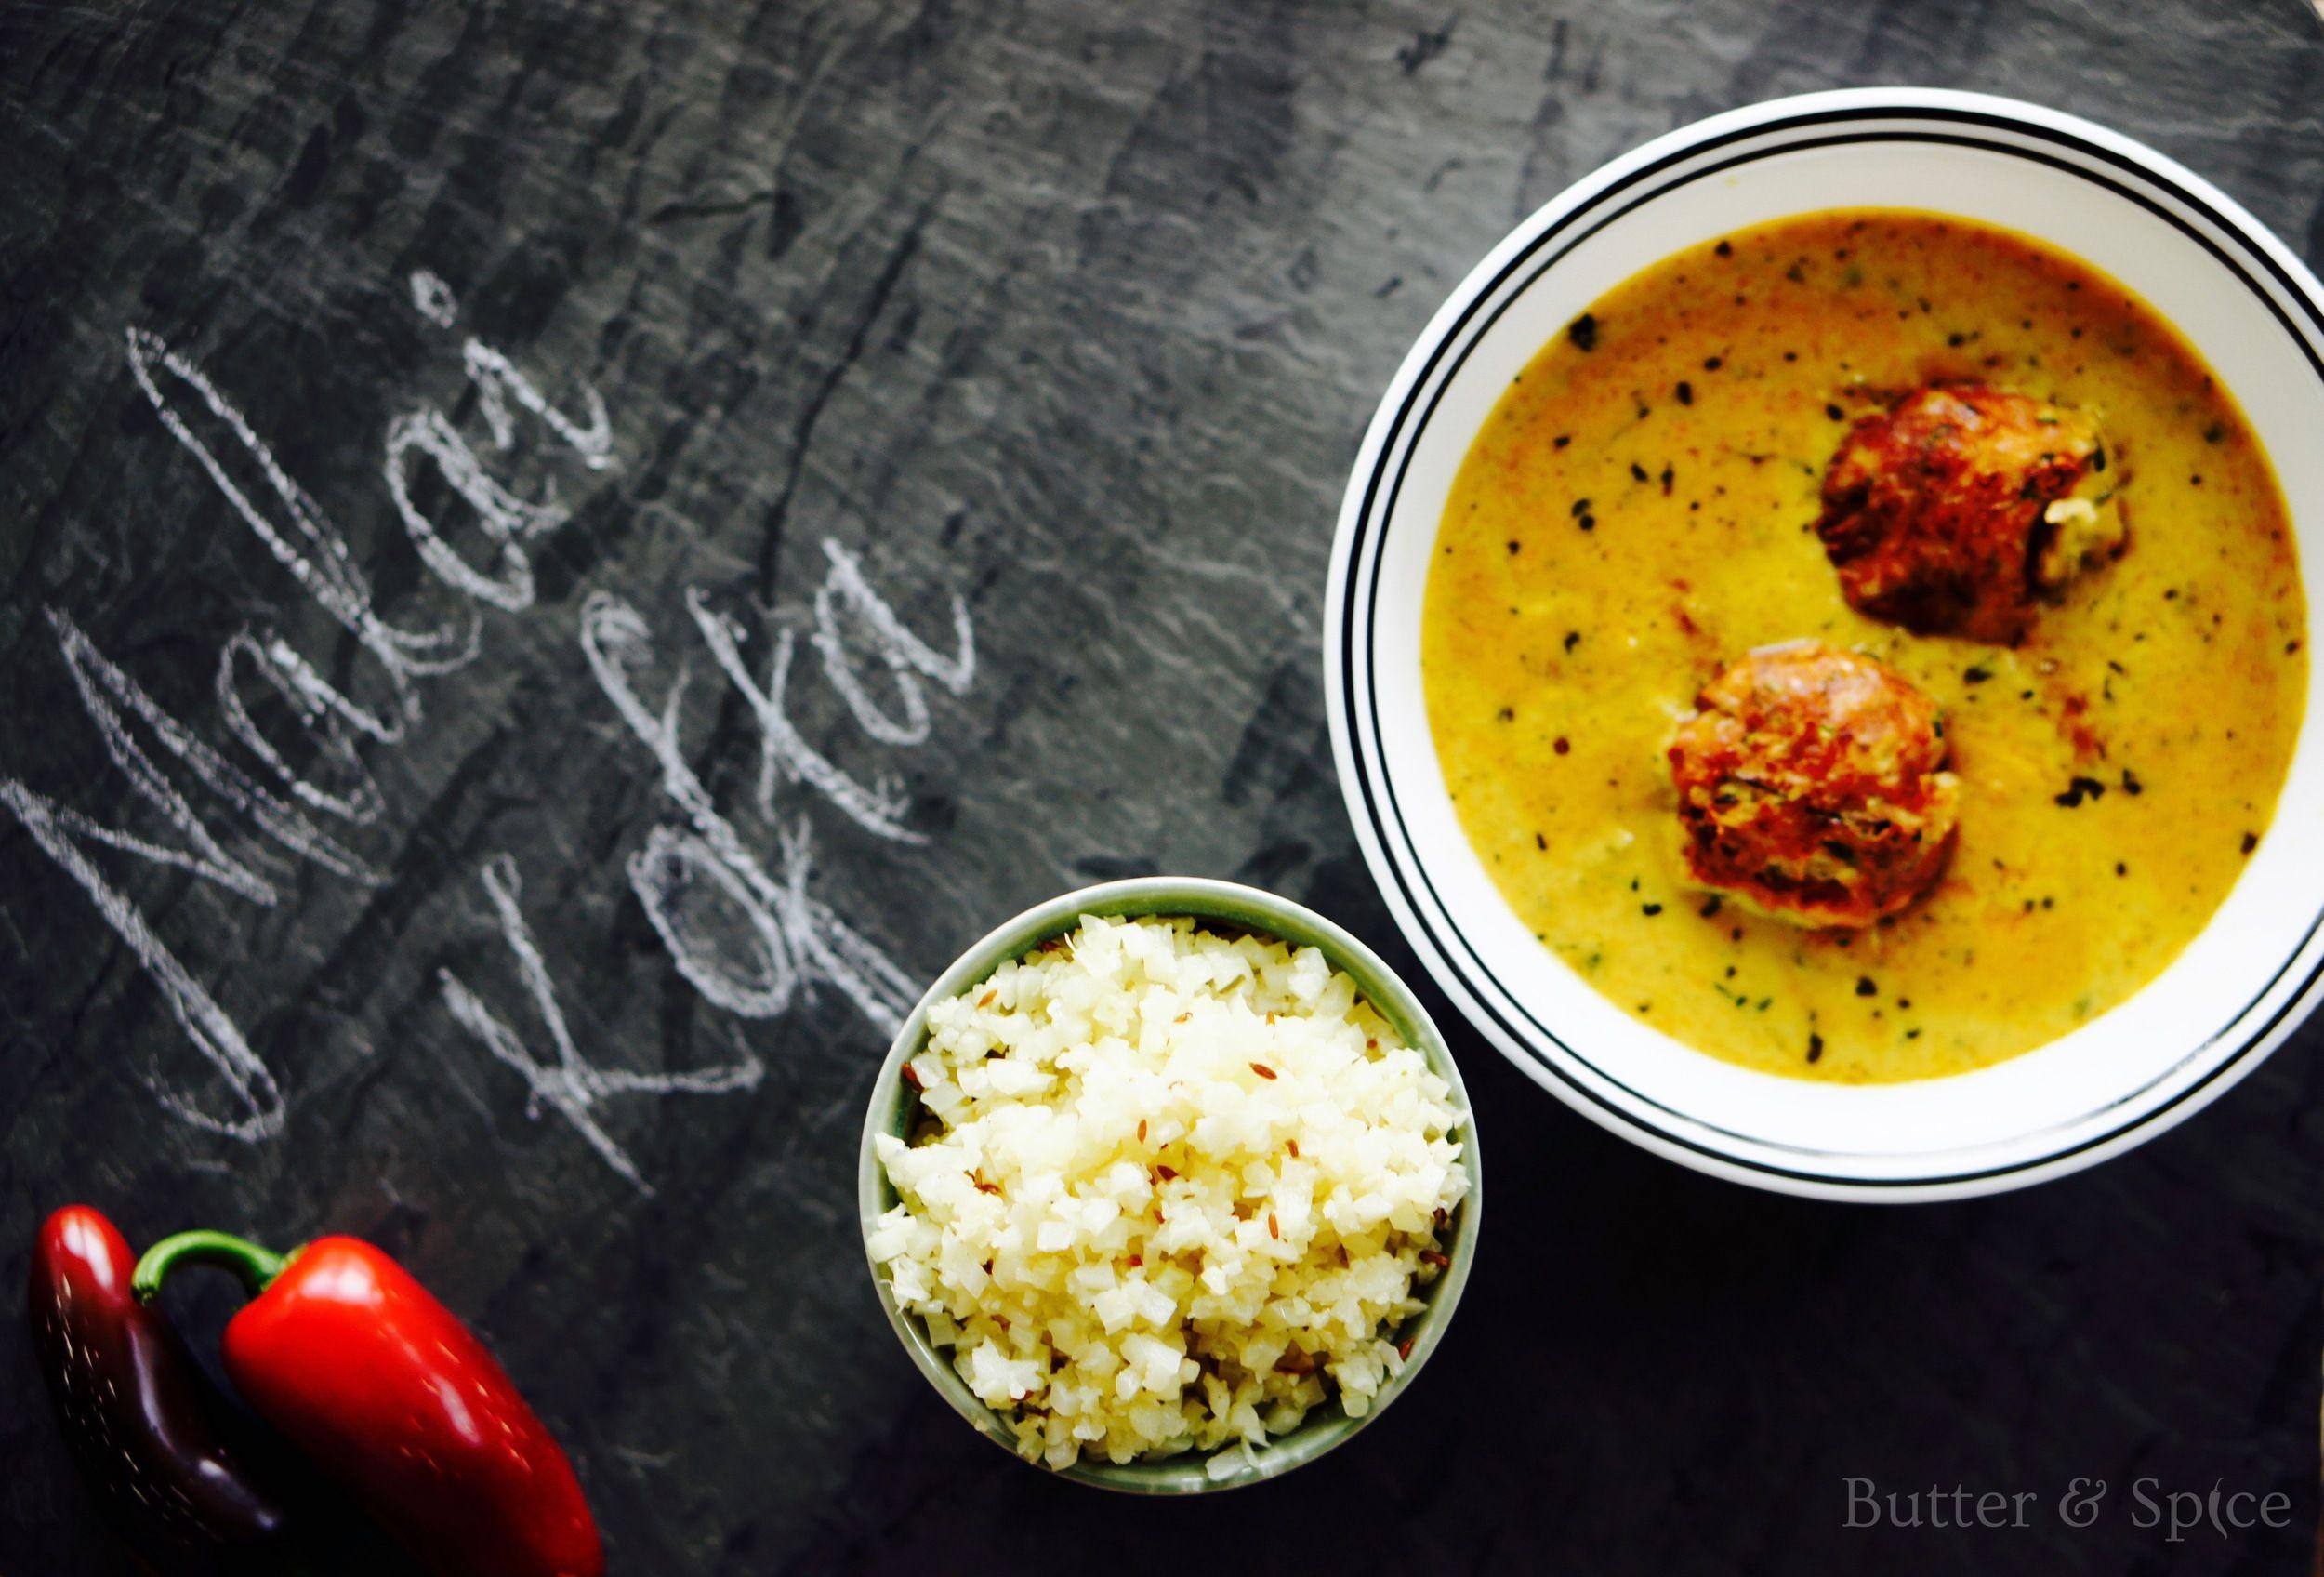 A low carb keto friendly version of Indian Malai Kofta